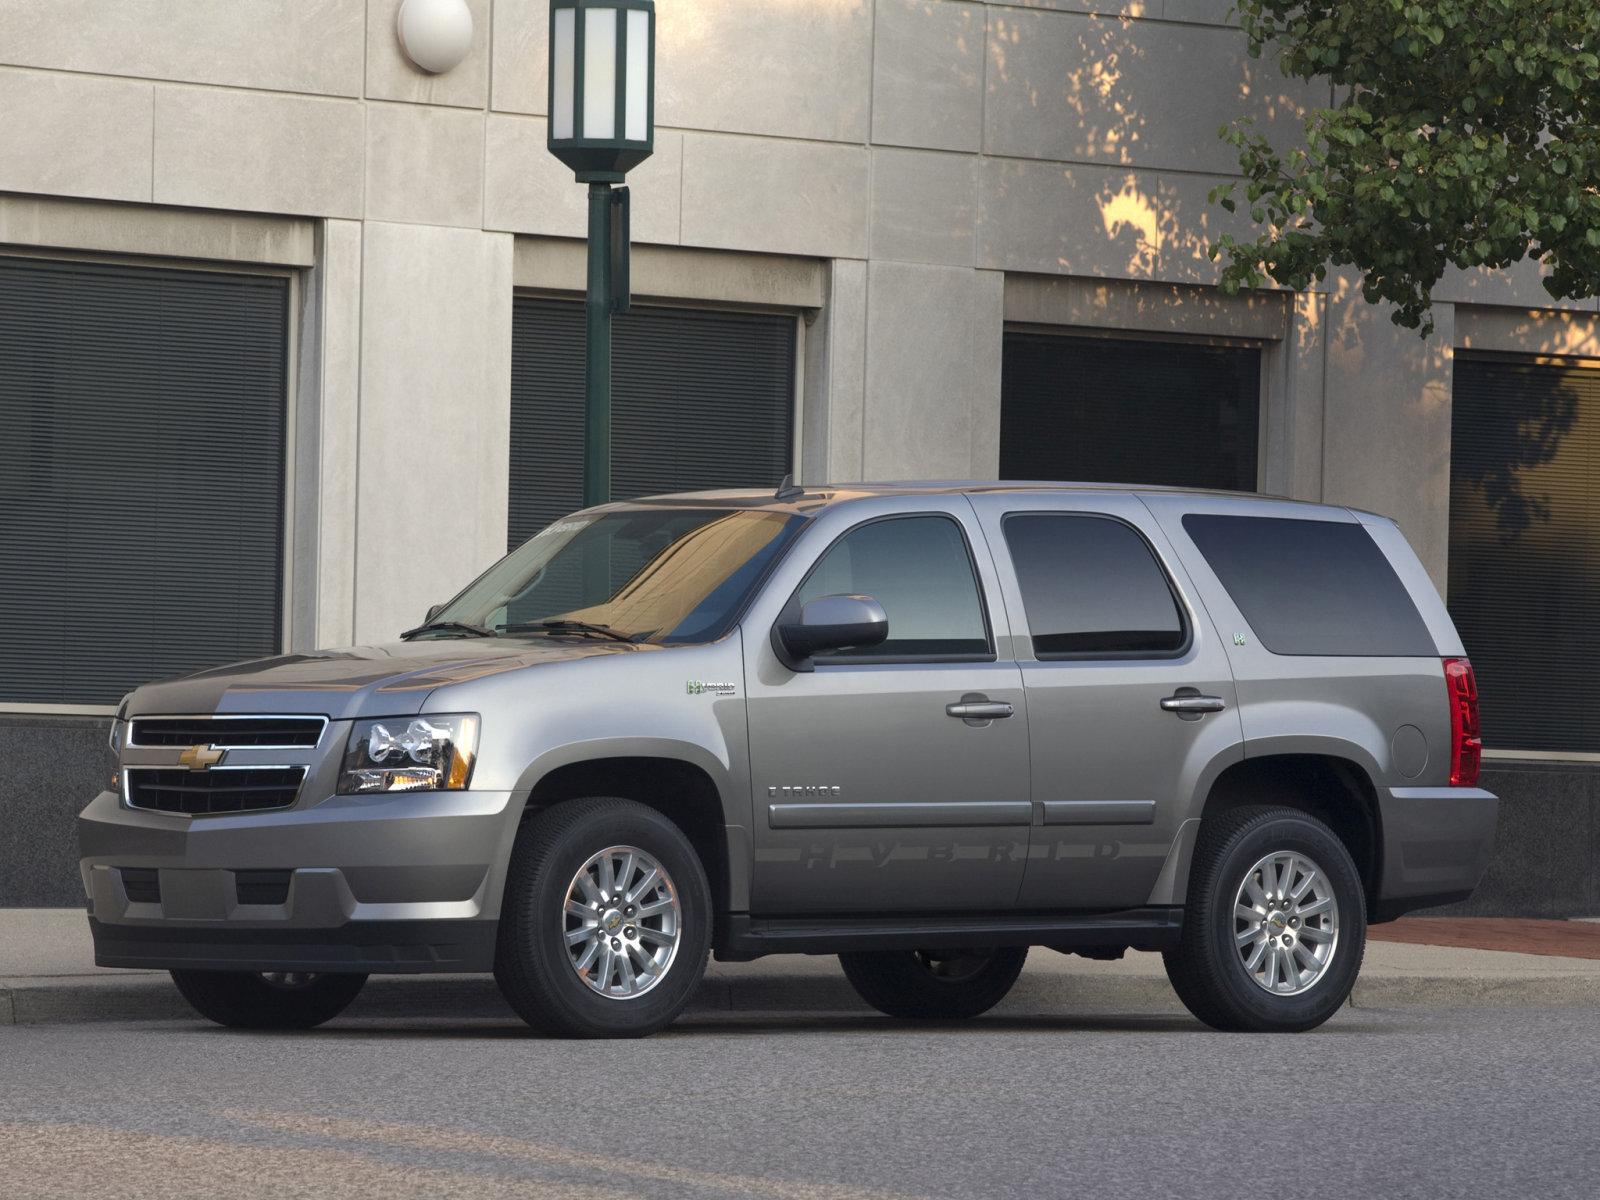 Download 2009 Chevrolet Tahoe Owners Manual Pdf Free